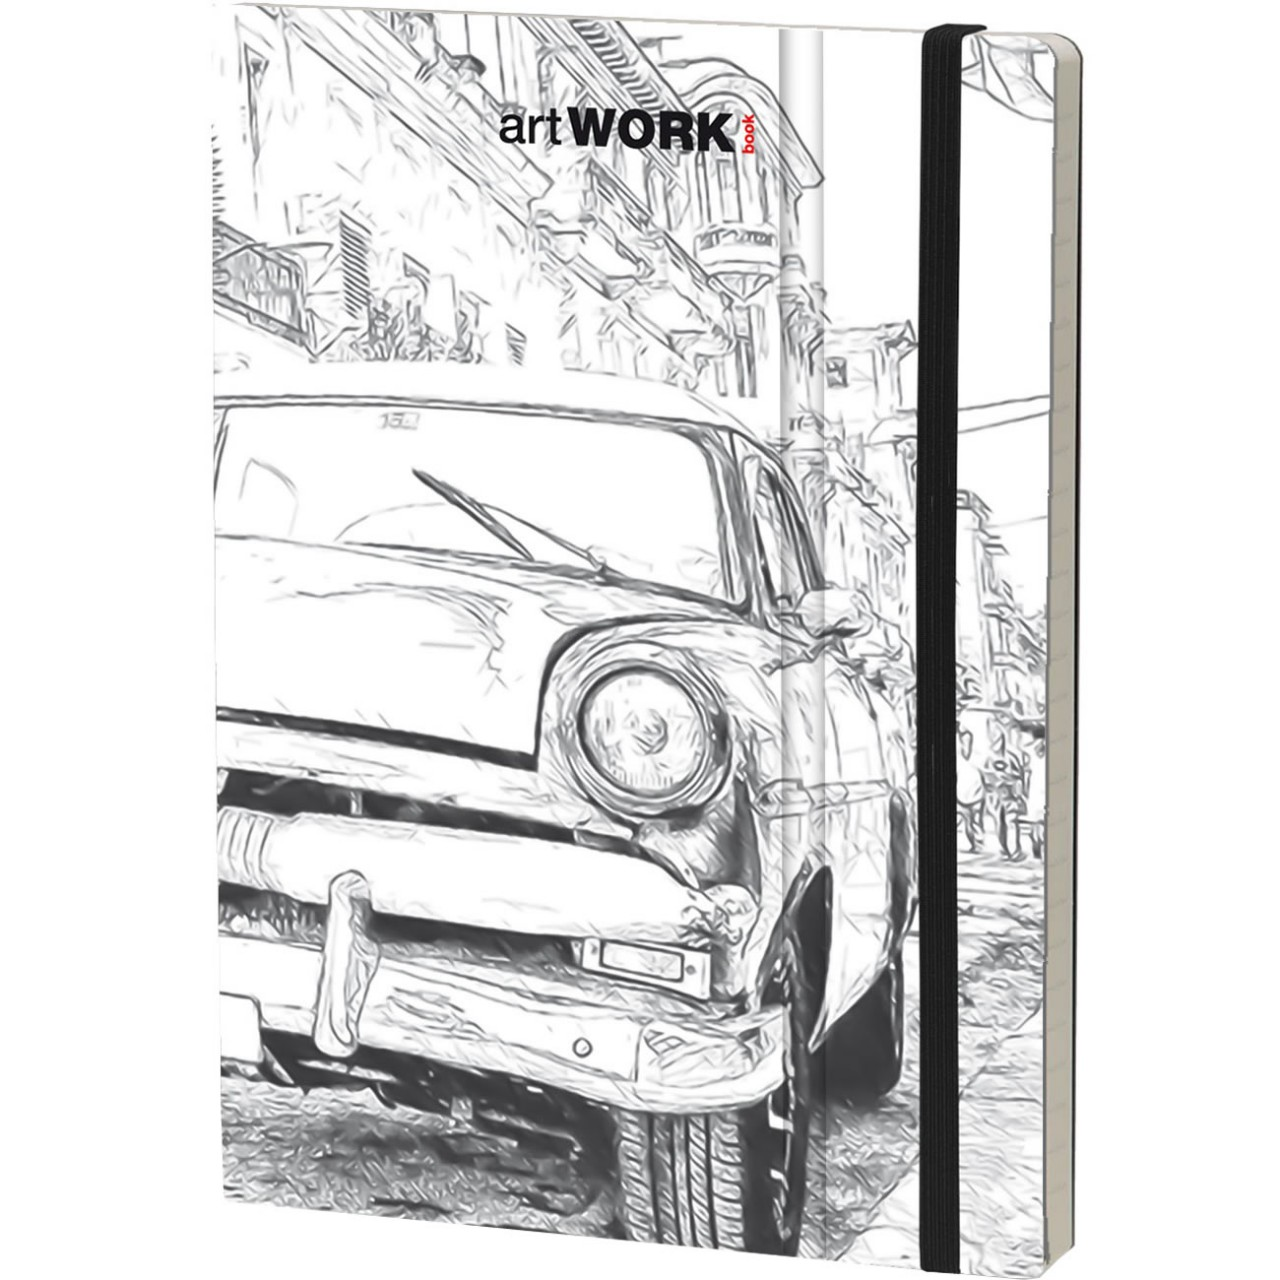 Stifflex Notizbuch ARTWORK BOOK 15 x 21 cm 192 S., HAVANA